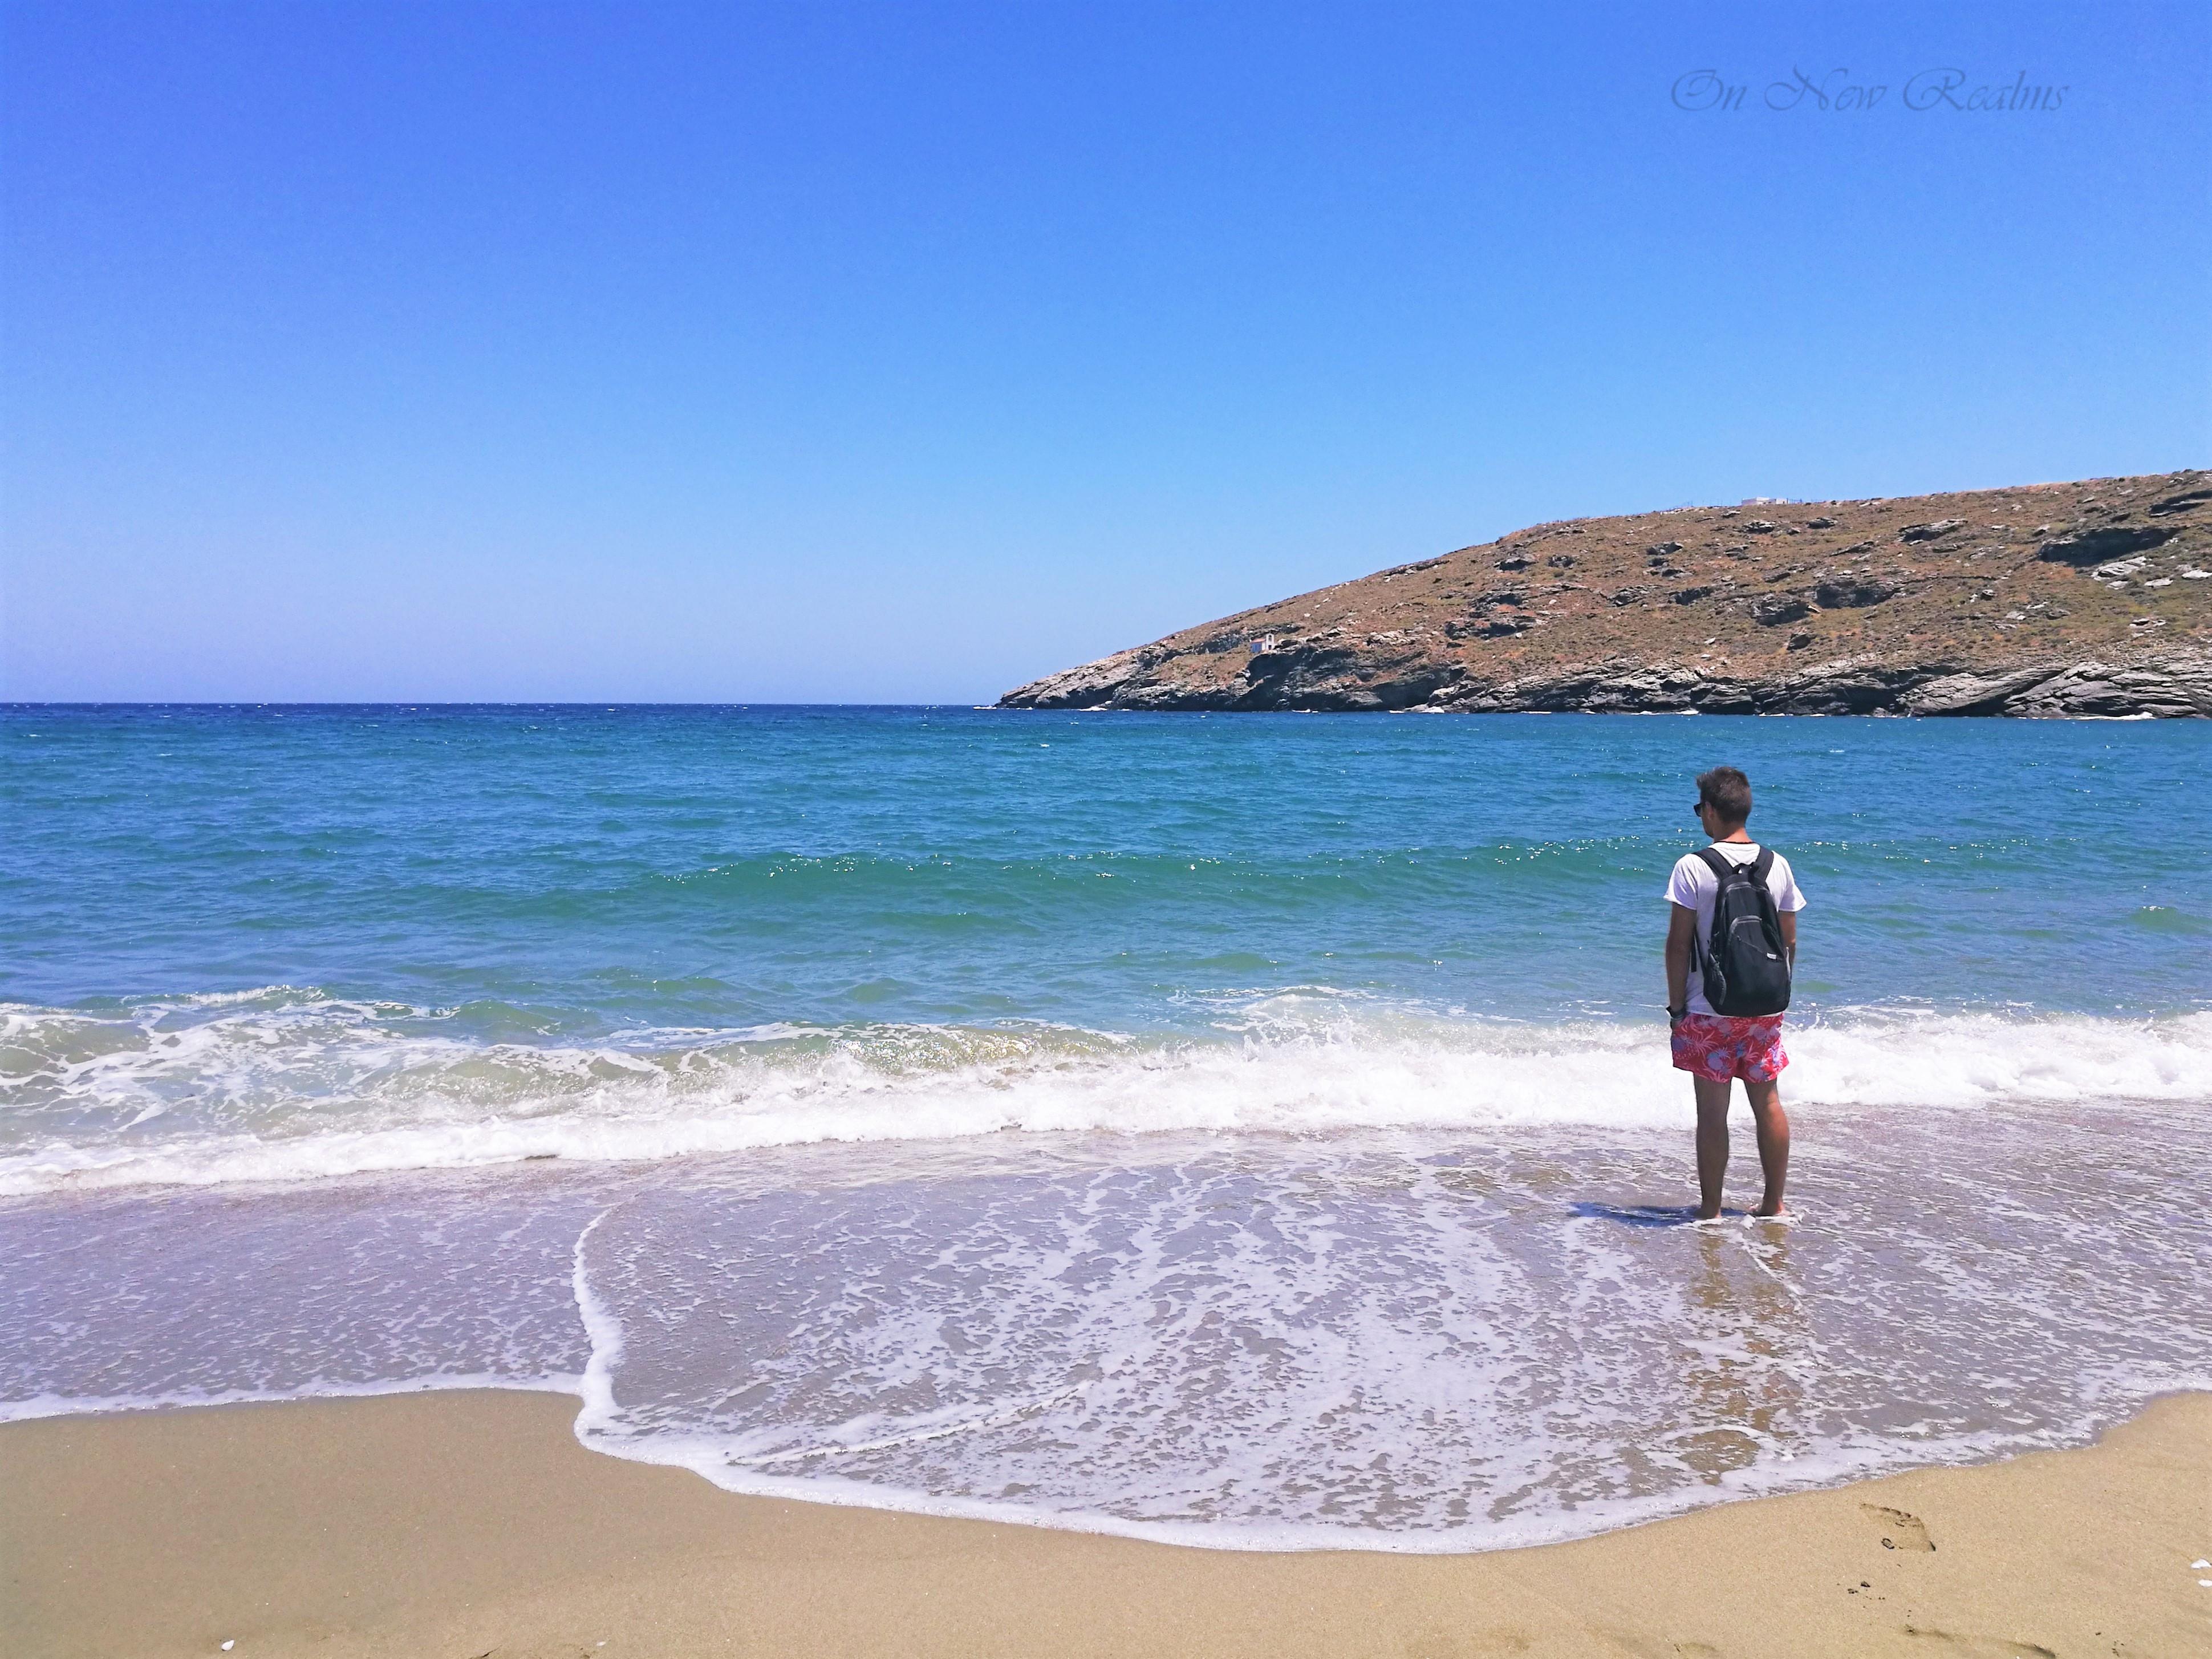 Paraporti-Beach-Chora-Andros-Greece